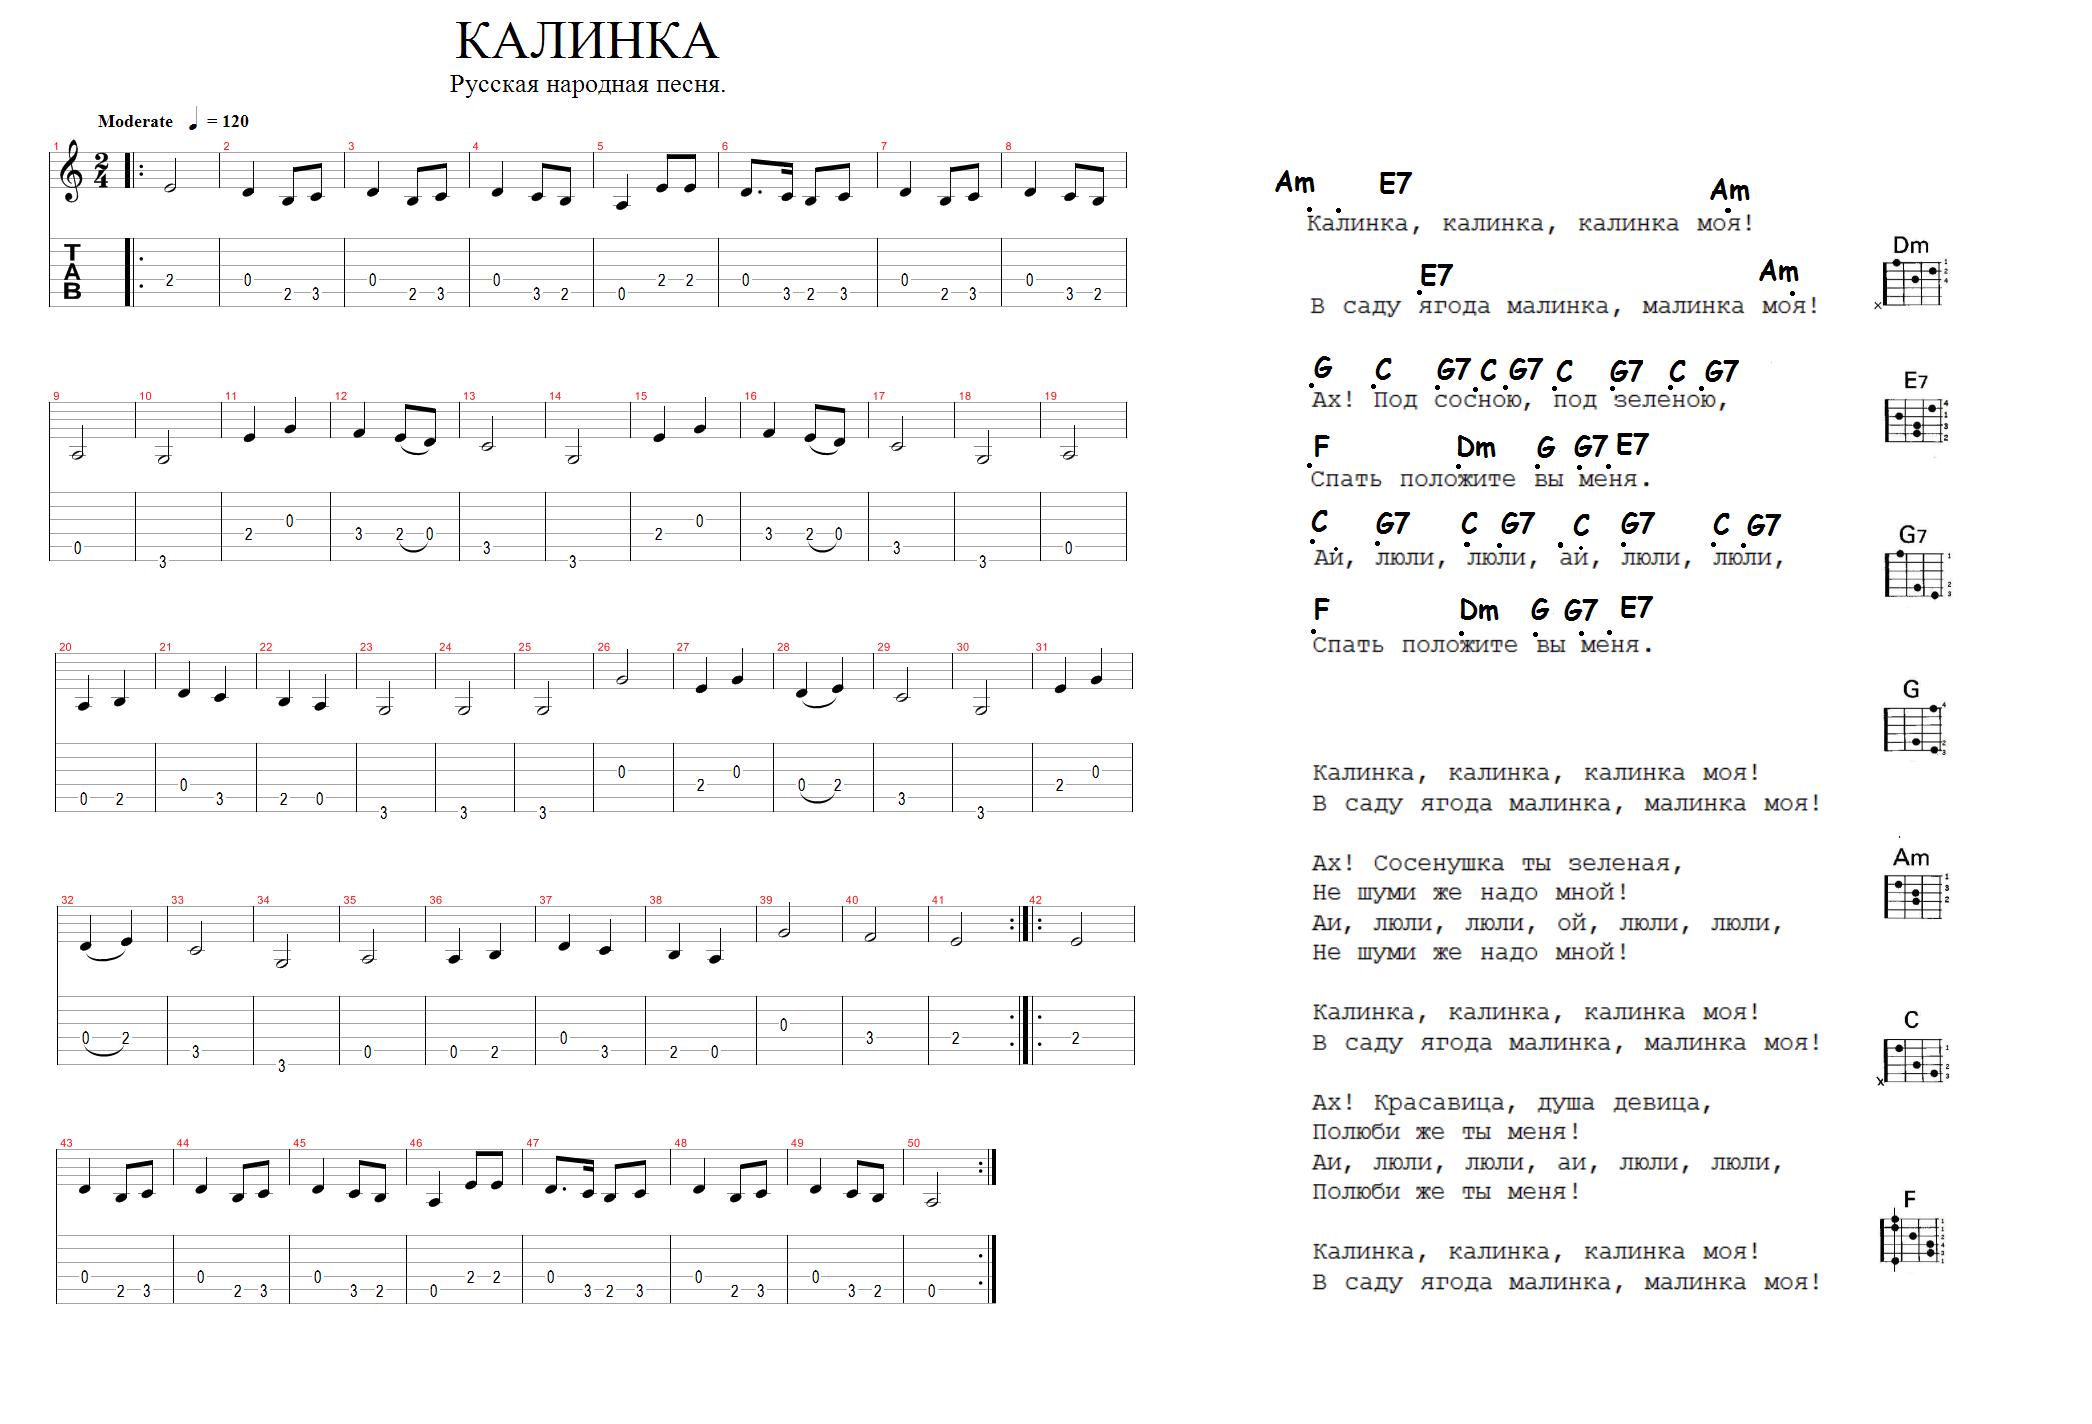 каталог ctp табулатуры русских народных песен